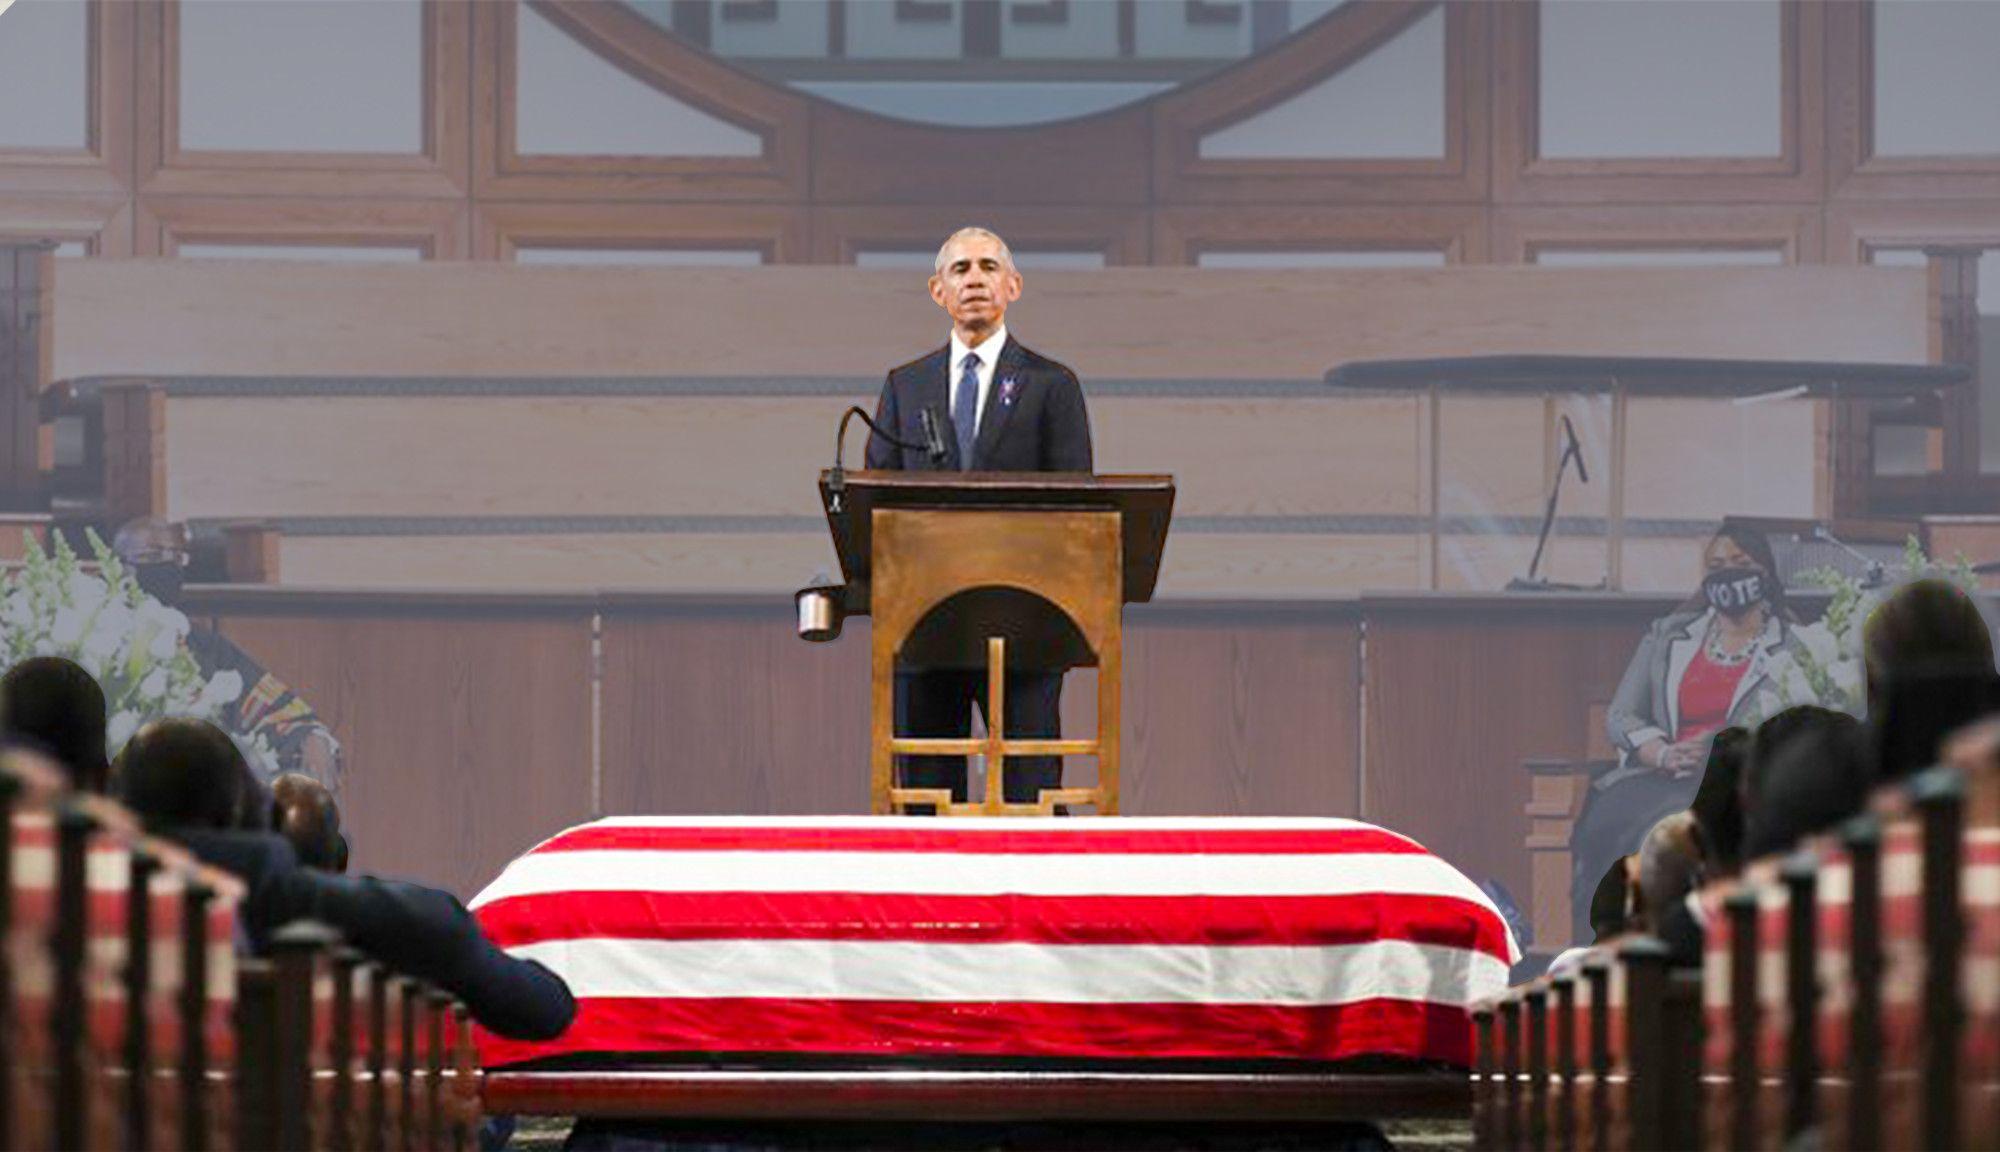 In His Eulogy for John Lewis, Barack Obama Just Changed the Landscape of a Joe Biden Presidency